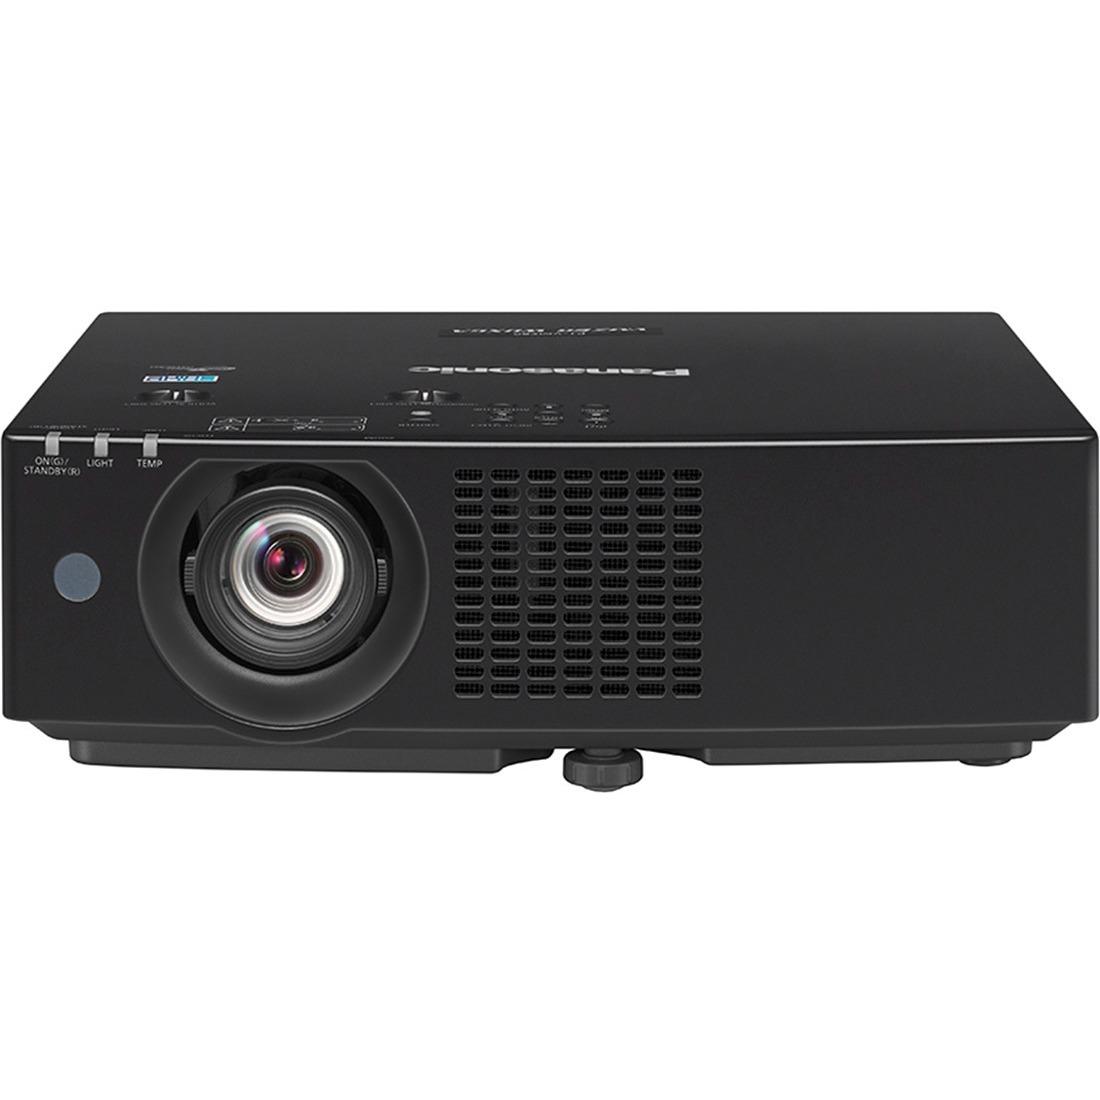 Panasonic SOLID SHINE PT-VMZ60U LCD Projector - 16:10 - Black_subImage_1